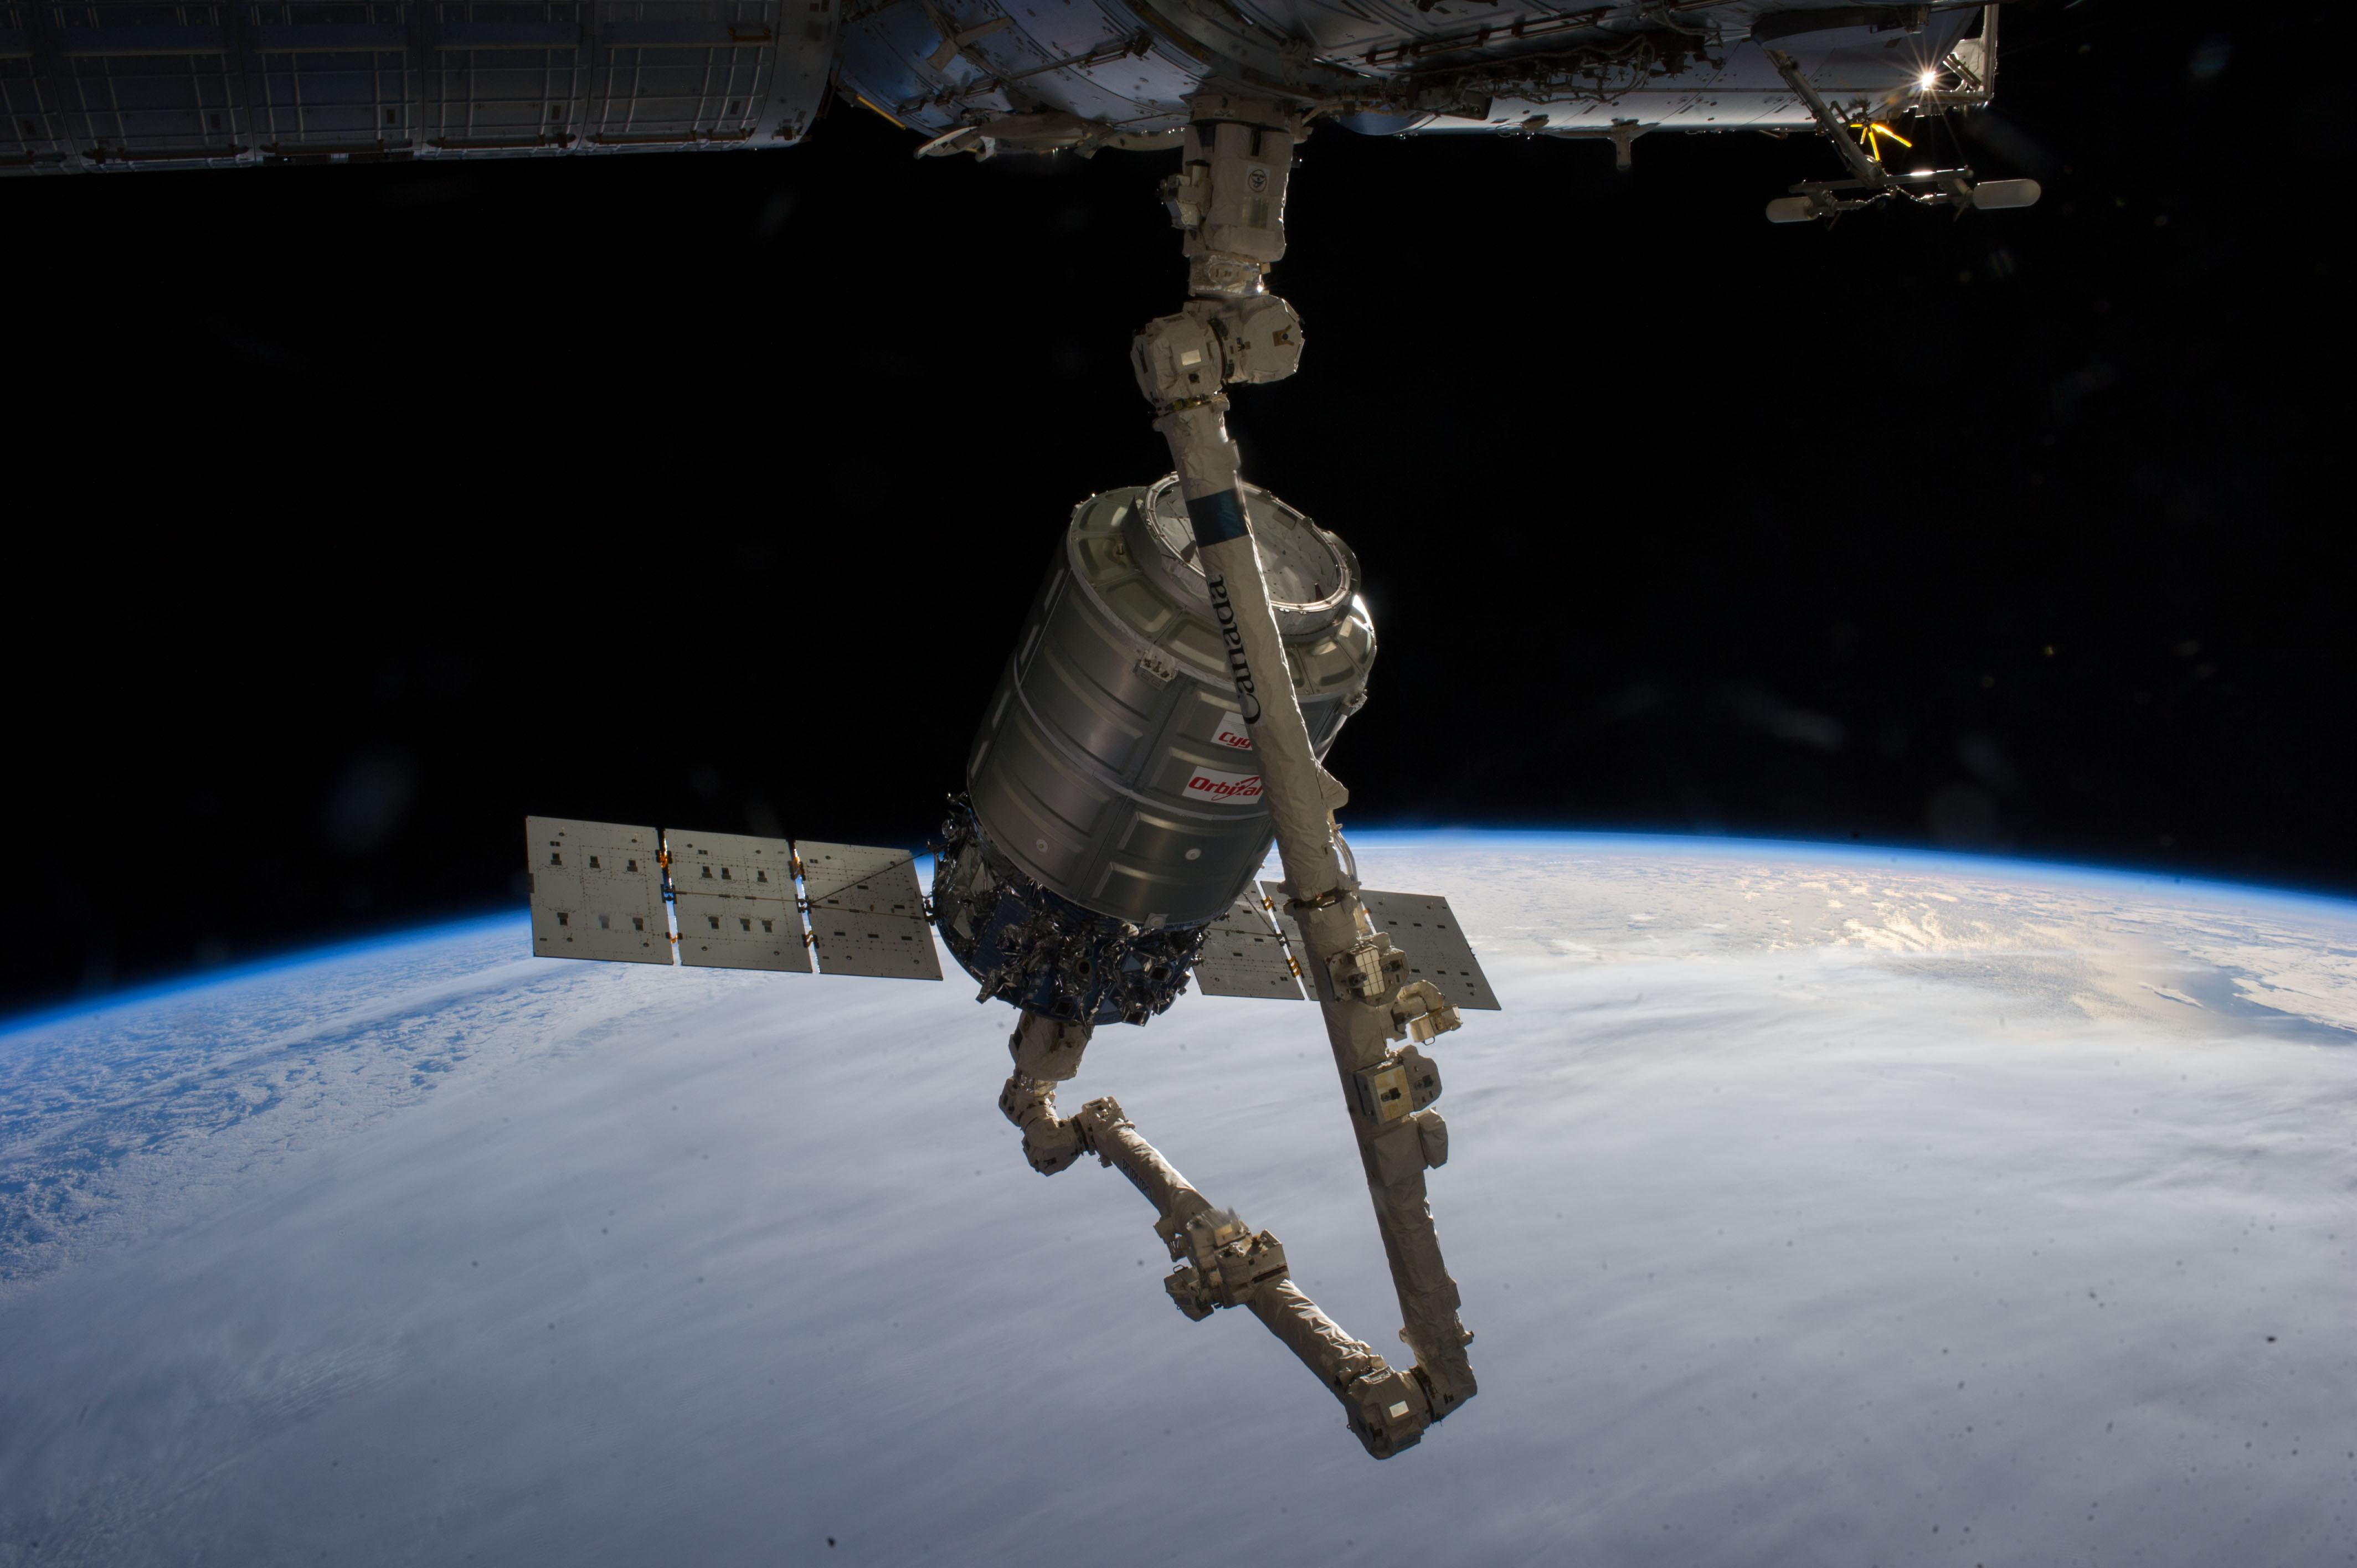 http://phys.org/news/2014-01-nanosatisfi-southern-stars-planet-labs.html